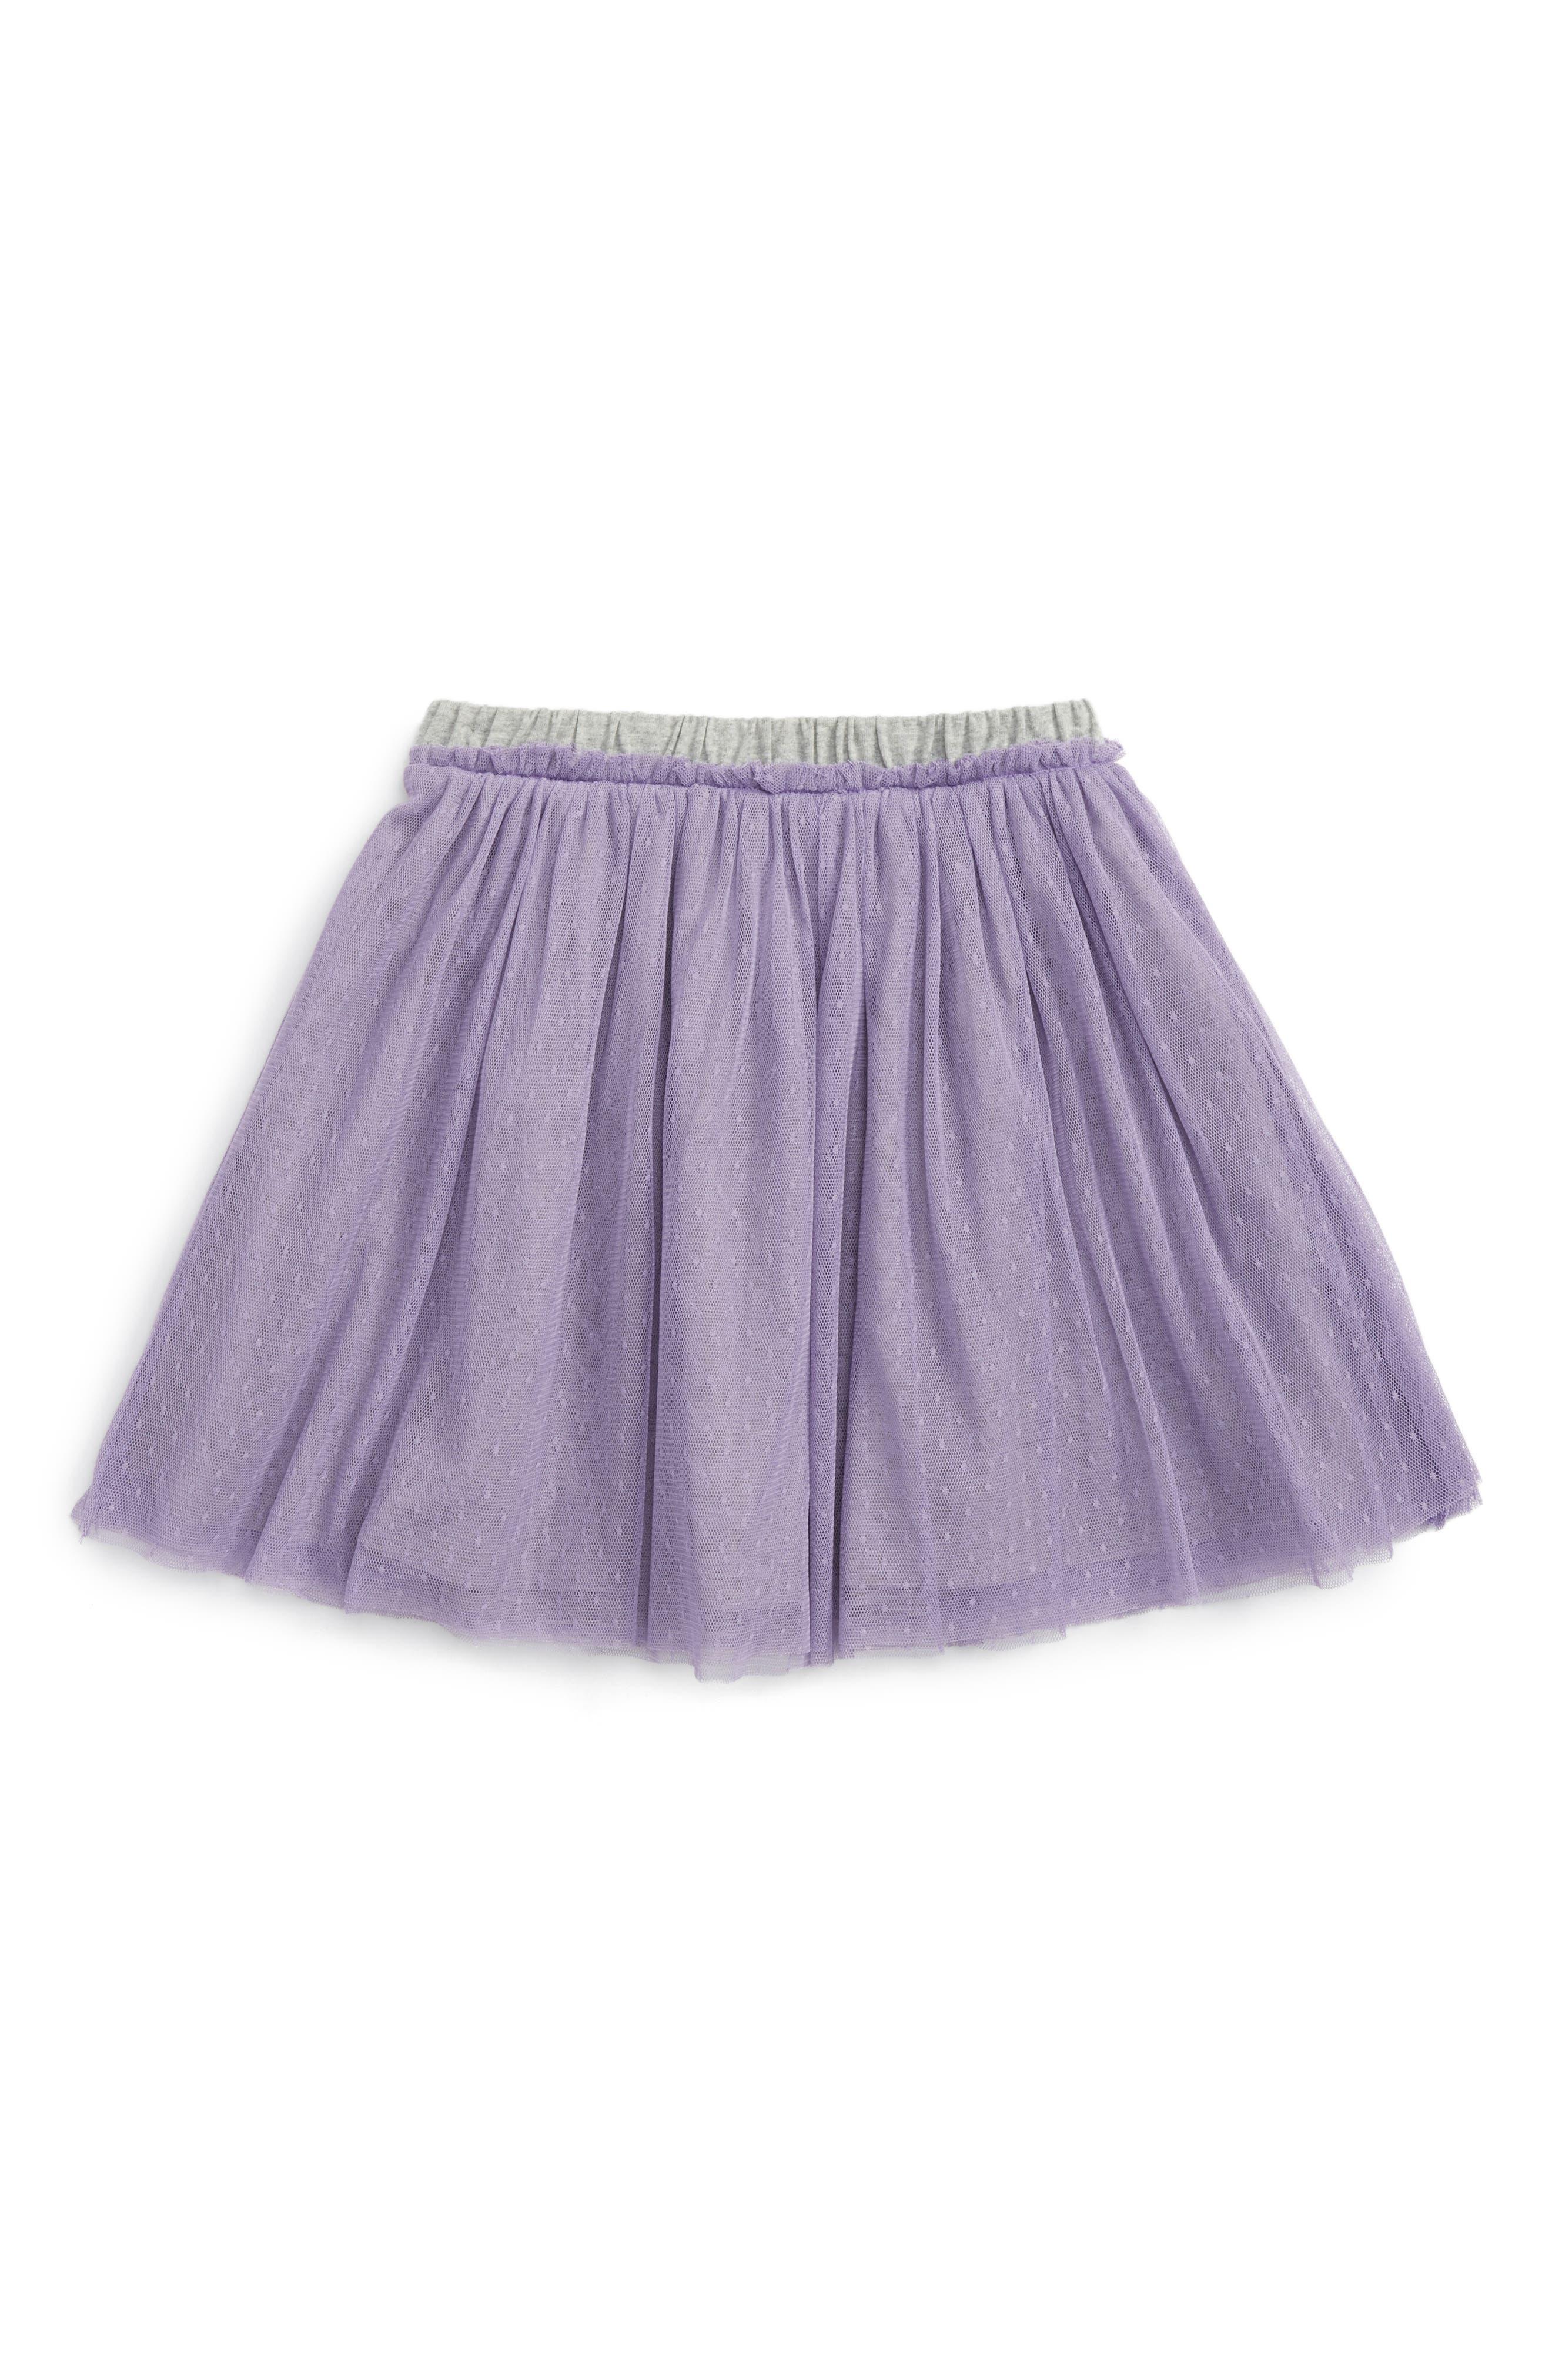 Main Image - Tea Collection Tulle Skirt (Toddler Girls, Little Girls & Big Girls)